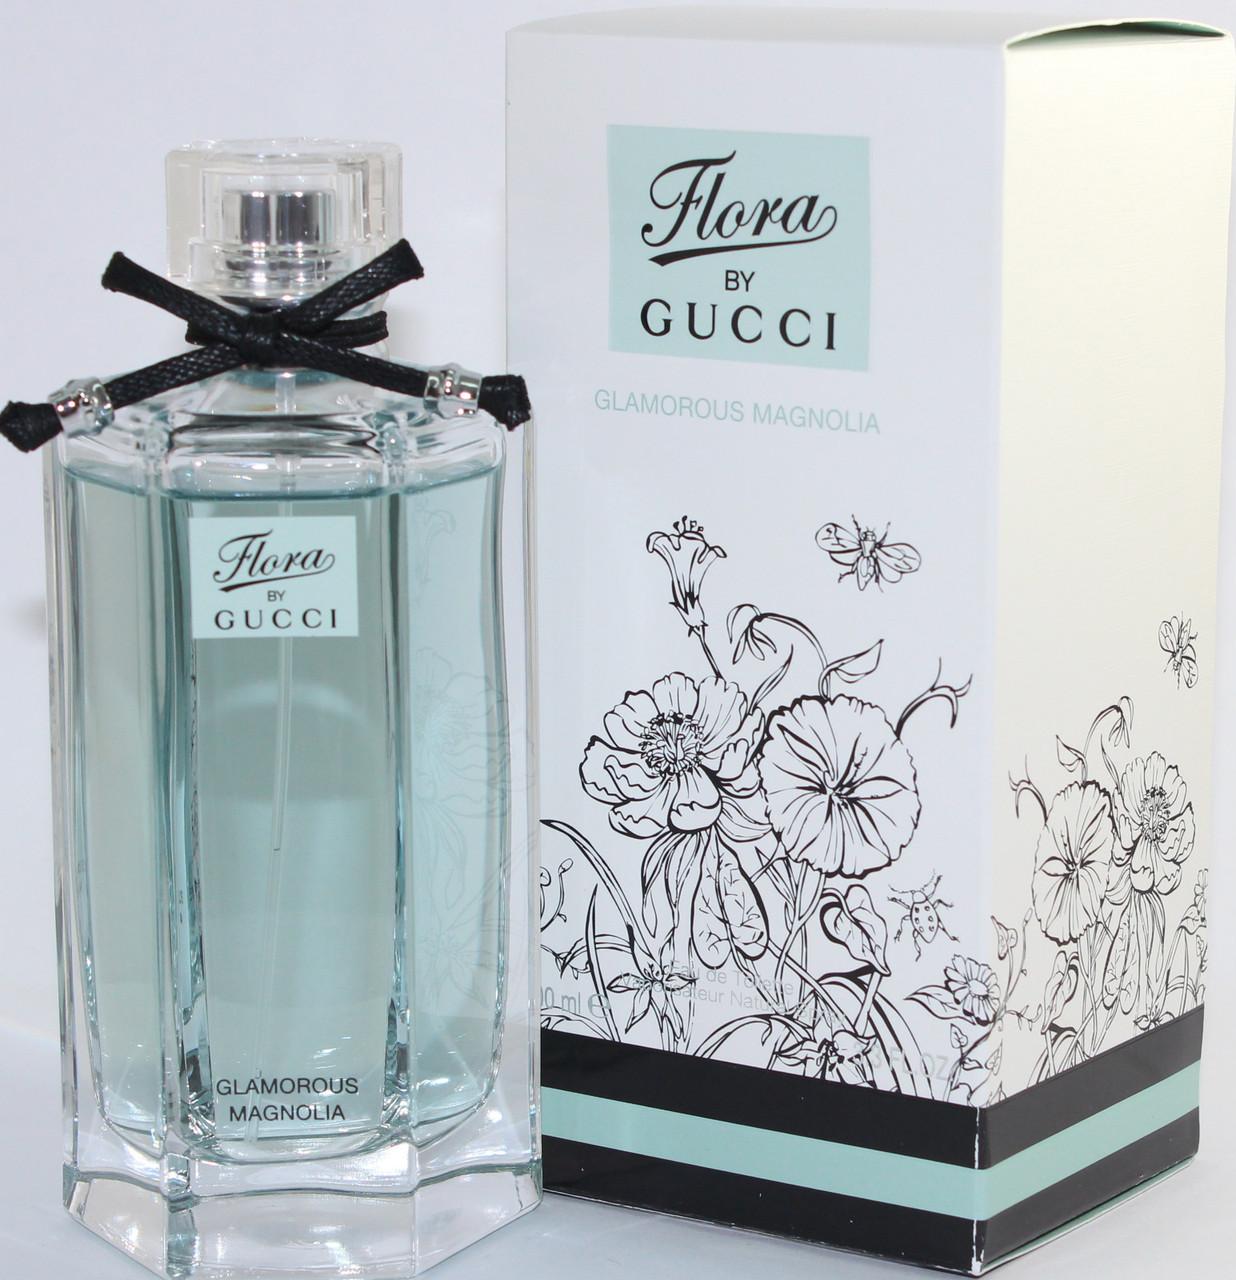 Женская парфюмерная вода Gucci Flora Glamorous Magnolia (Гуччи Флора  Гламурус Магнолия) 157eaad54a4ae